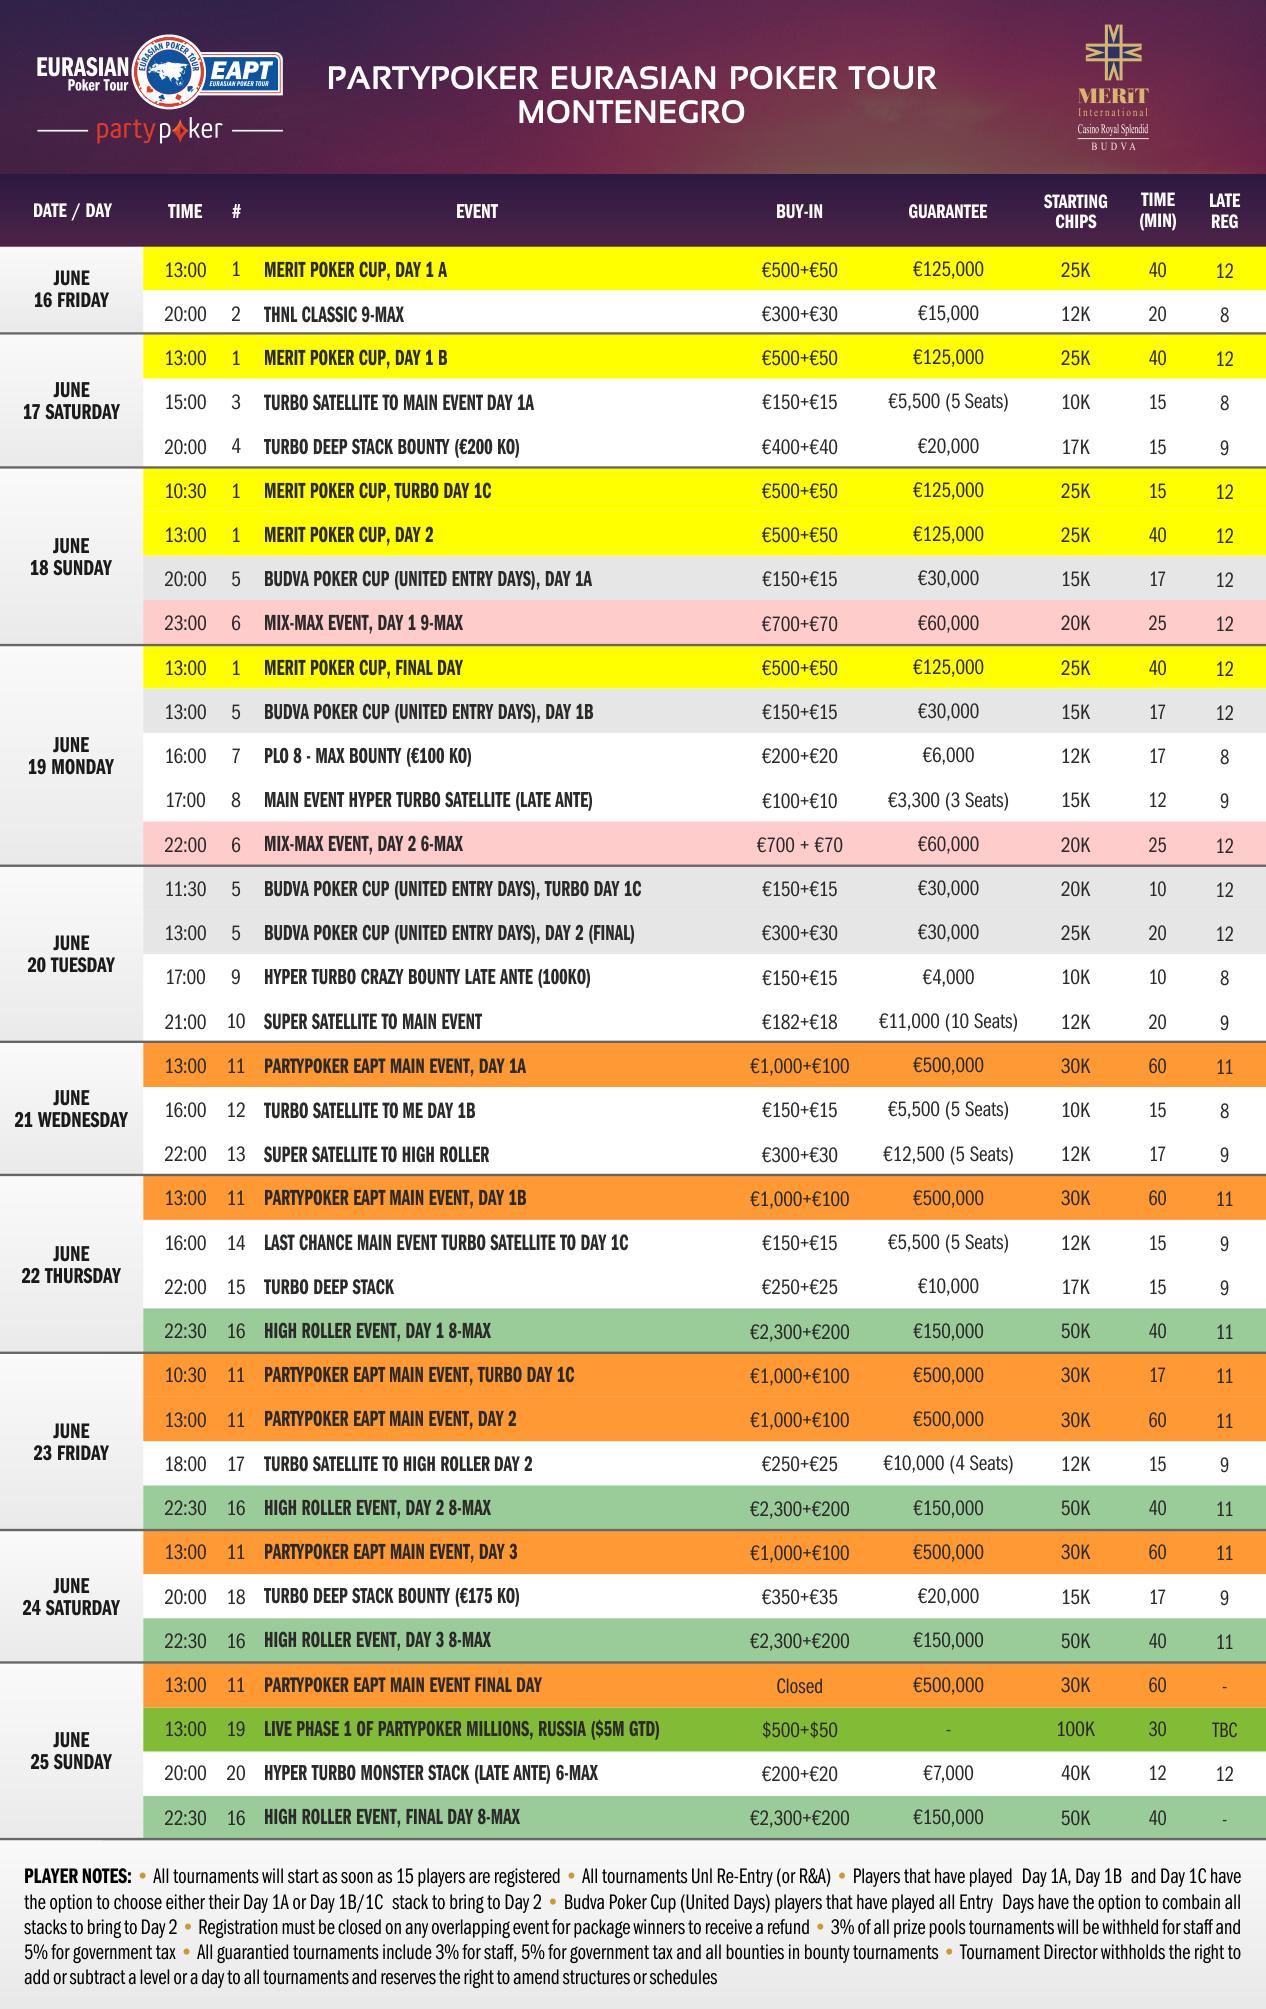 Partypoker i EURASIA Poker Tour u Budvi 16 - 25 Juna 101